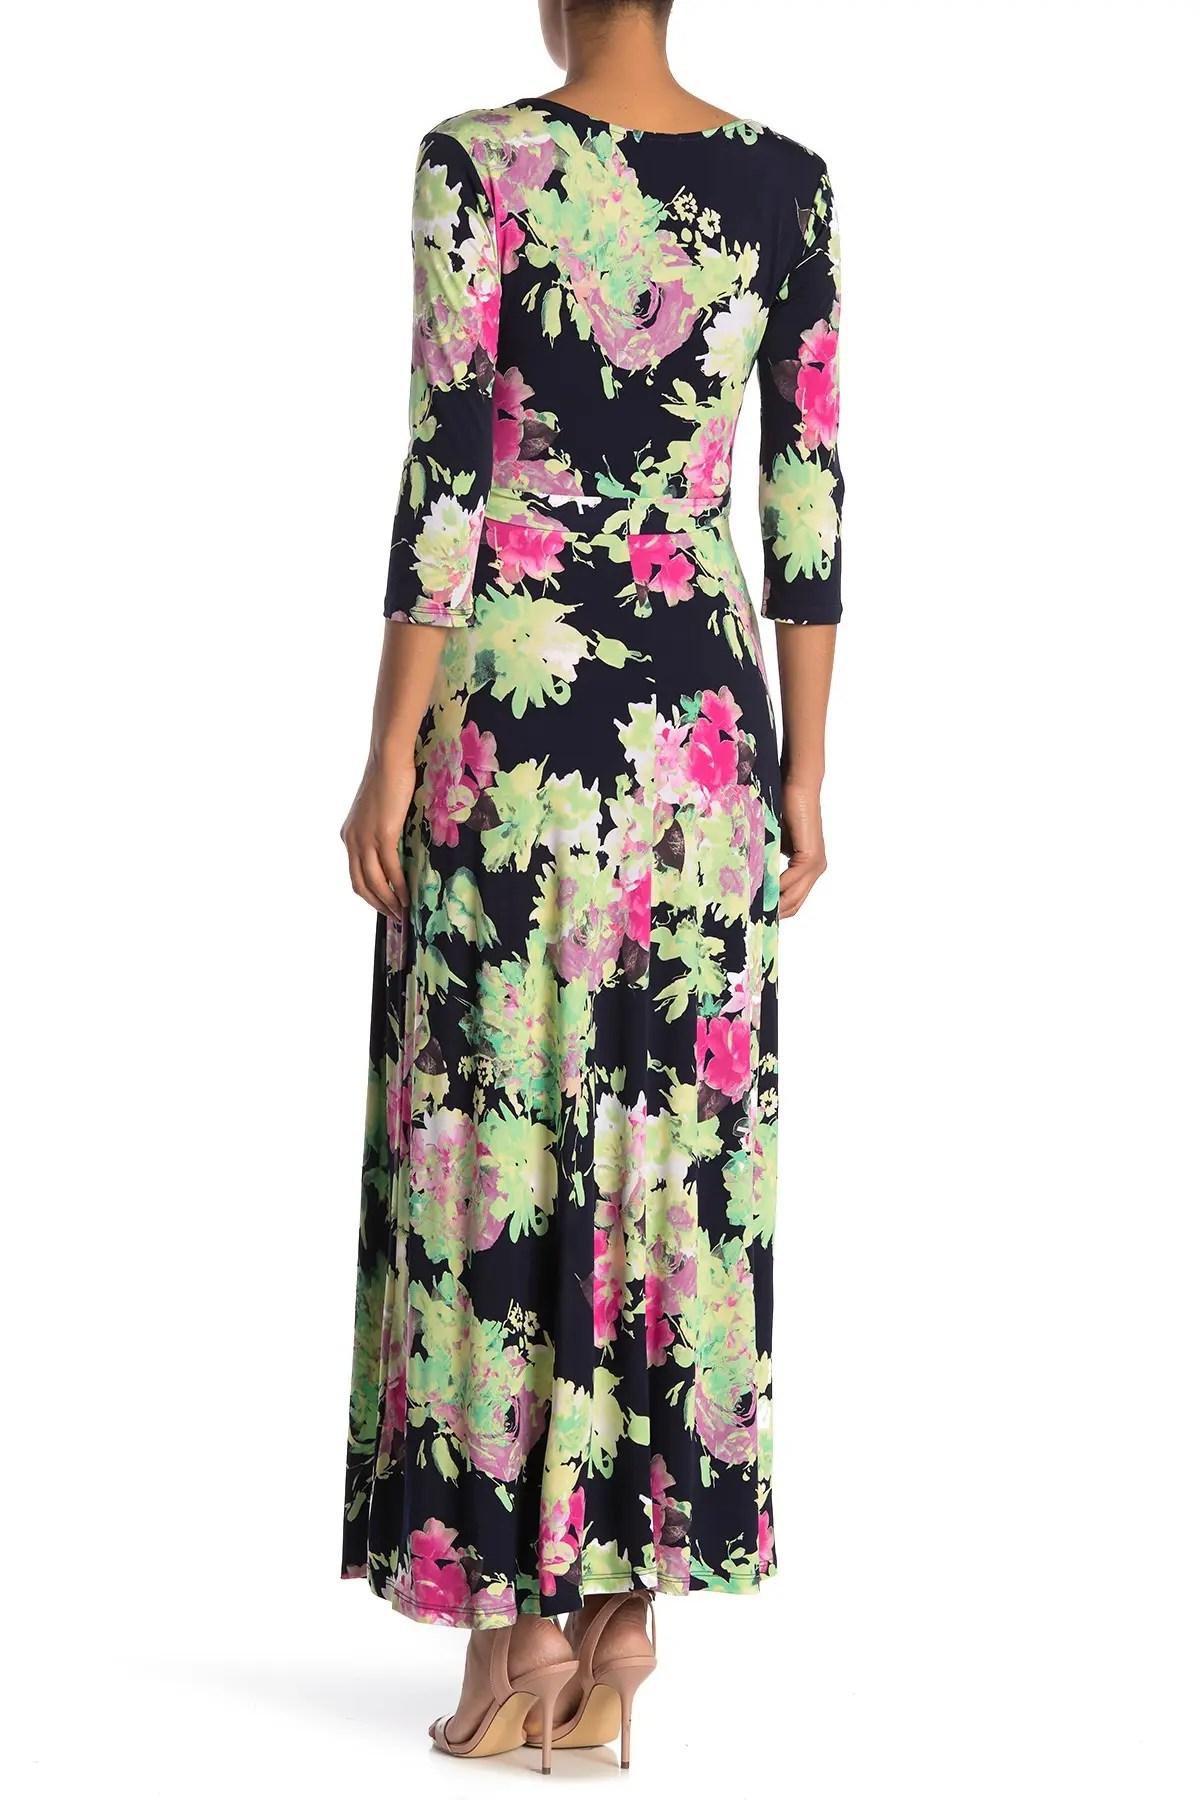 west kei floral 3 4 length sleeve maxi dress nordstrom rack